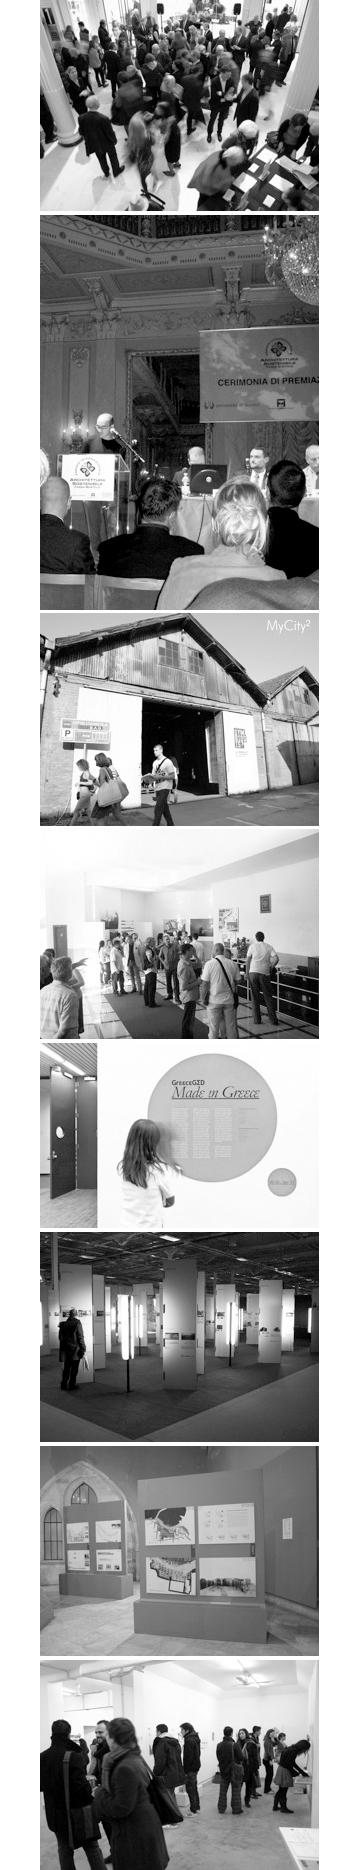 exhibitions bw.jpg